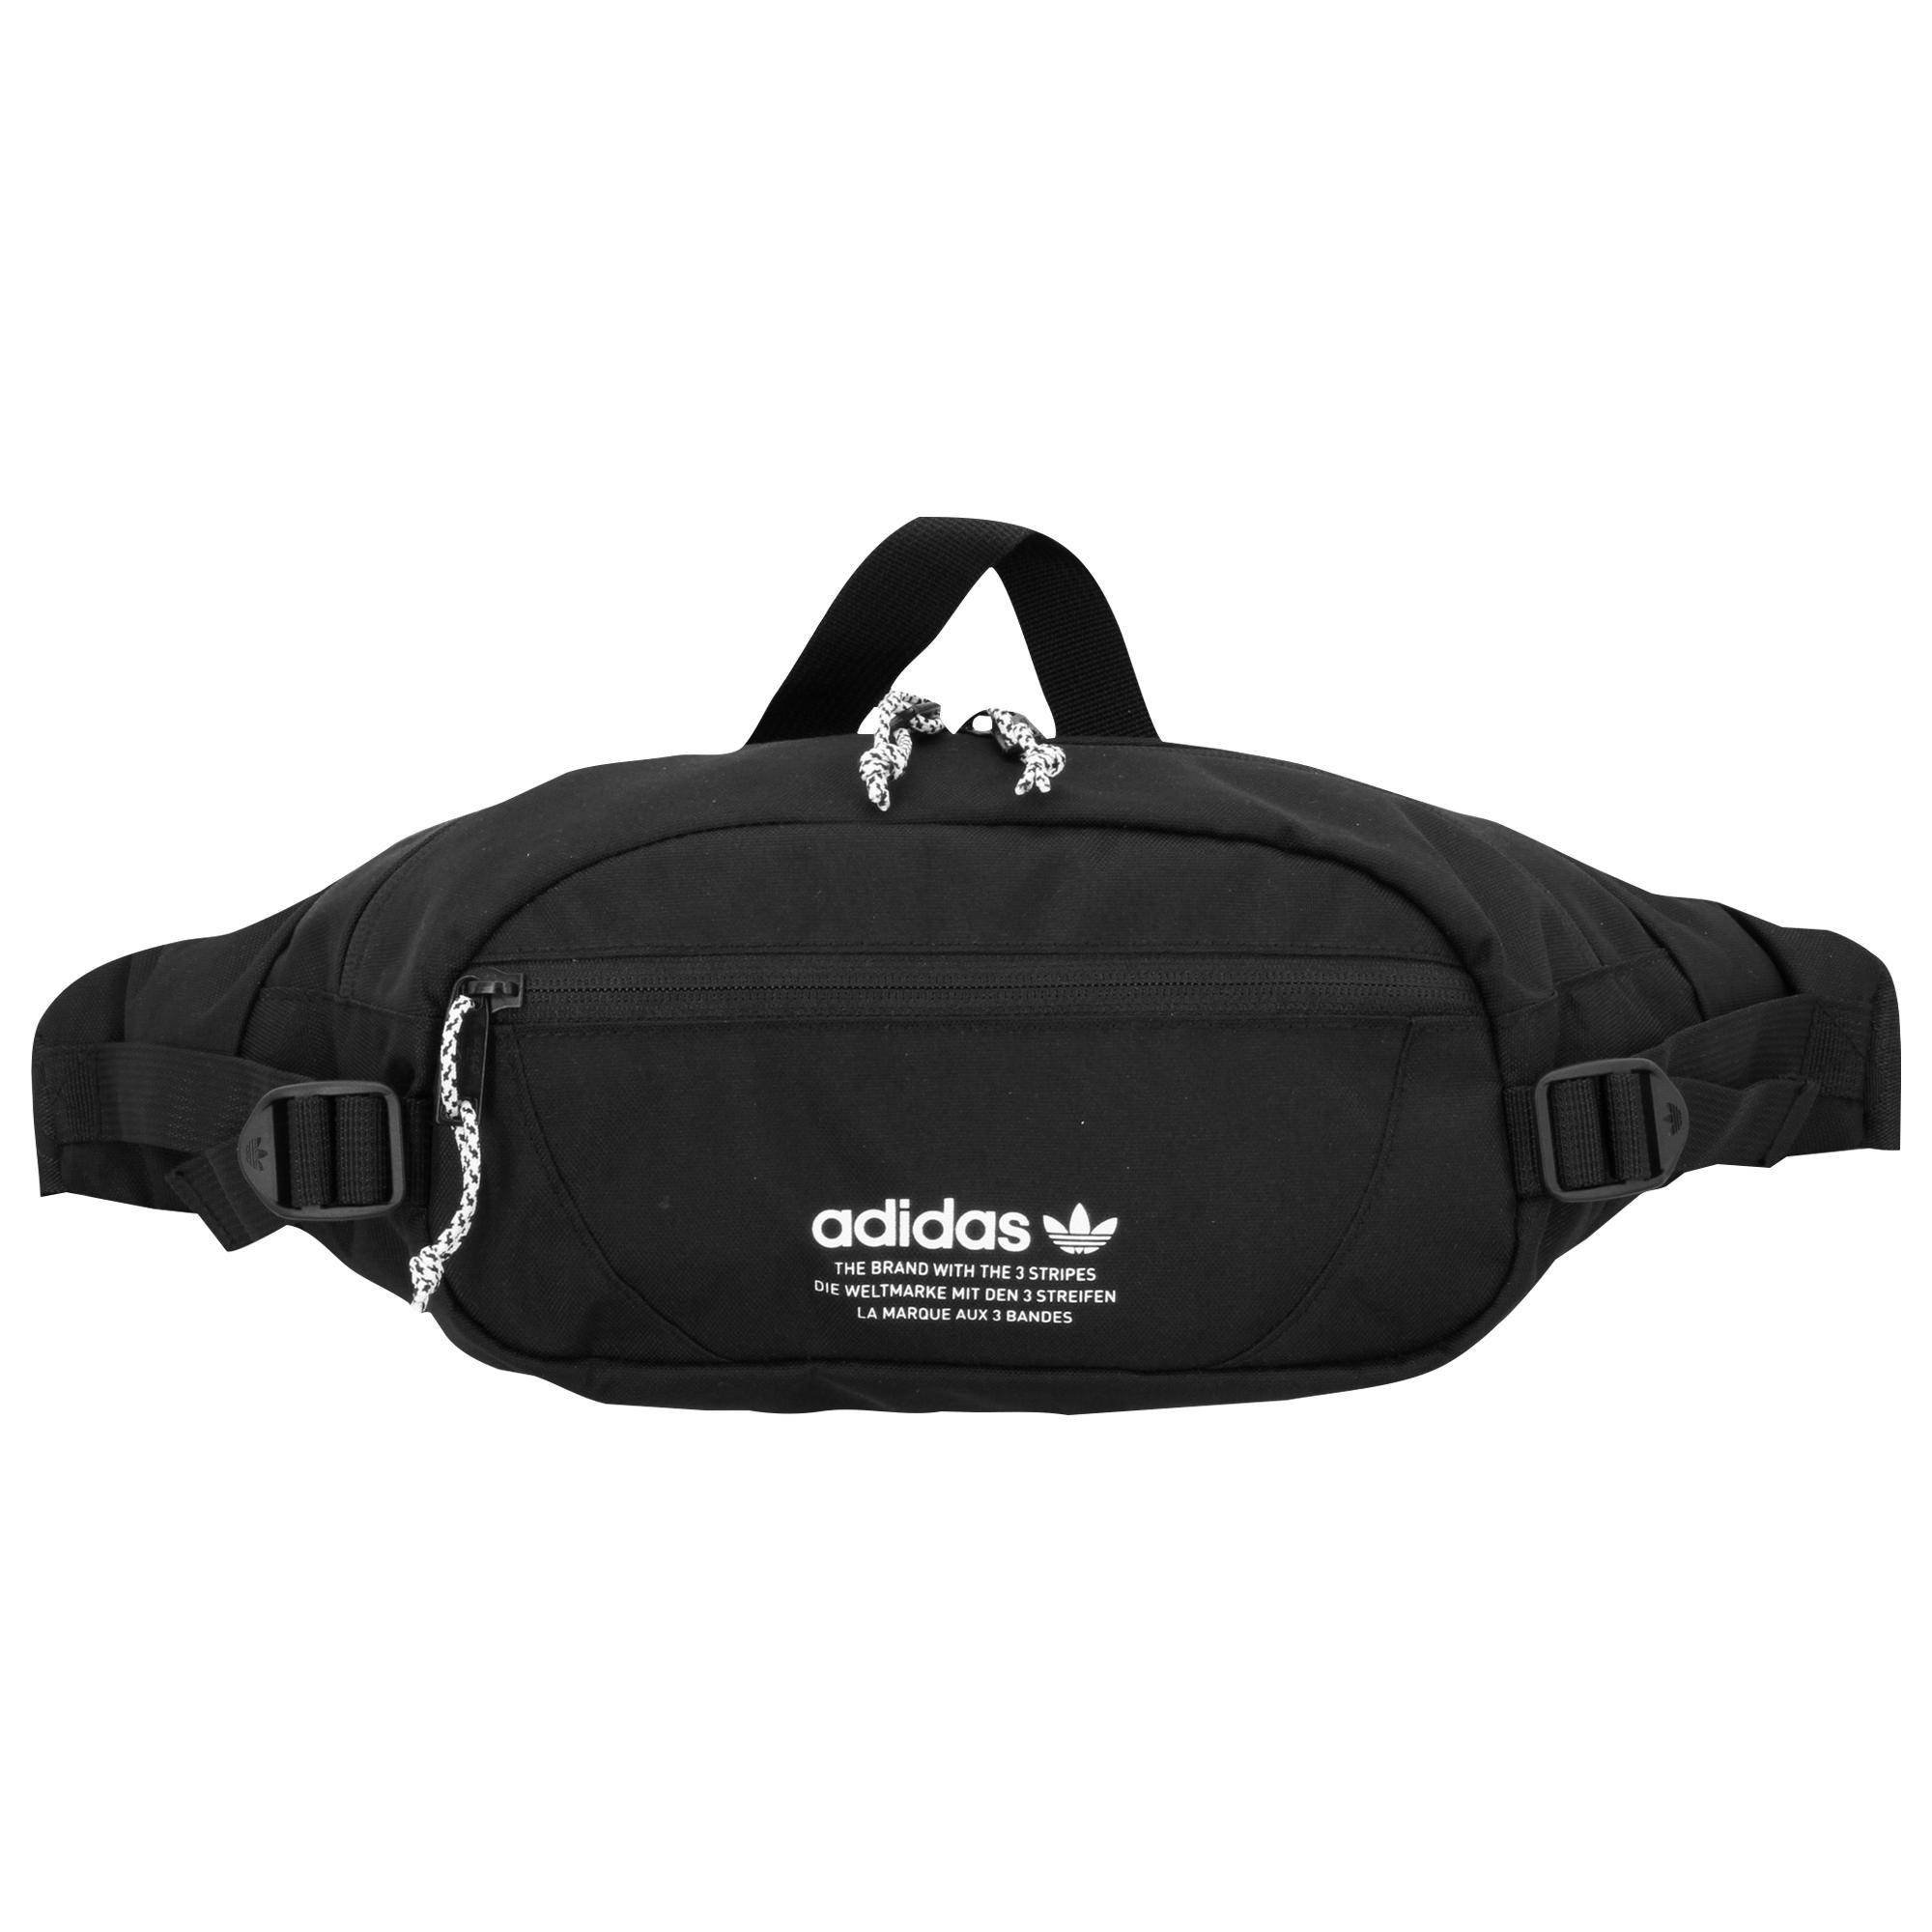 Lyst - adidas Originals Utility Crossbody Pack in Black for Men 1fcd13c5a2fd6